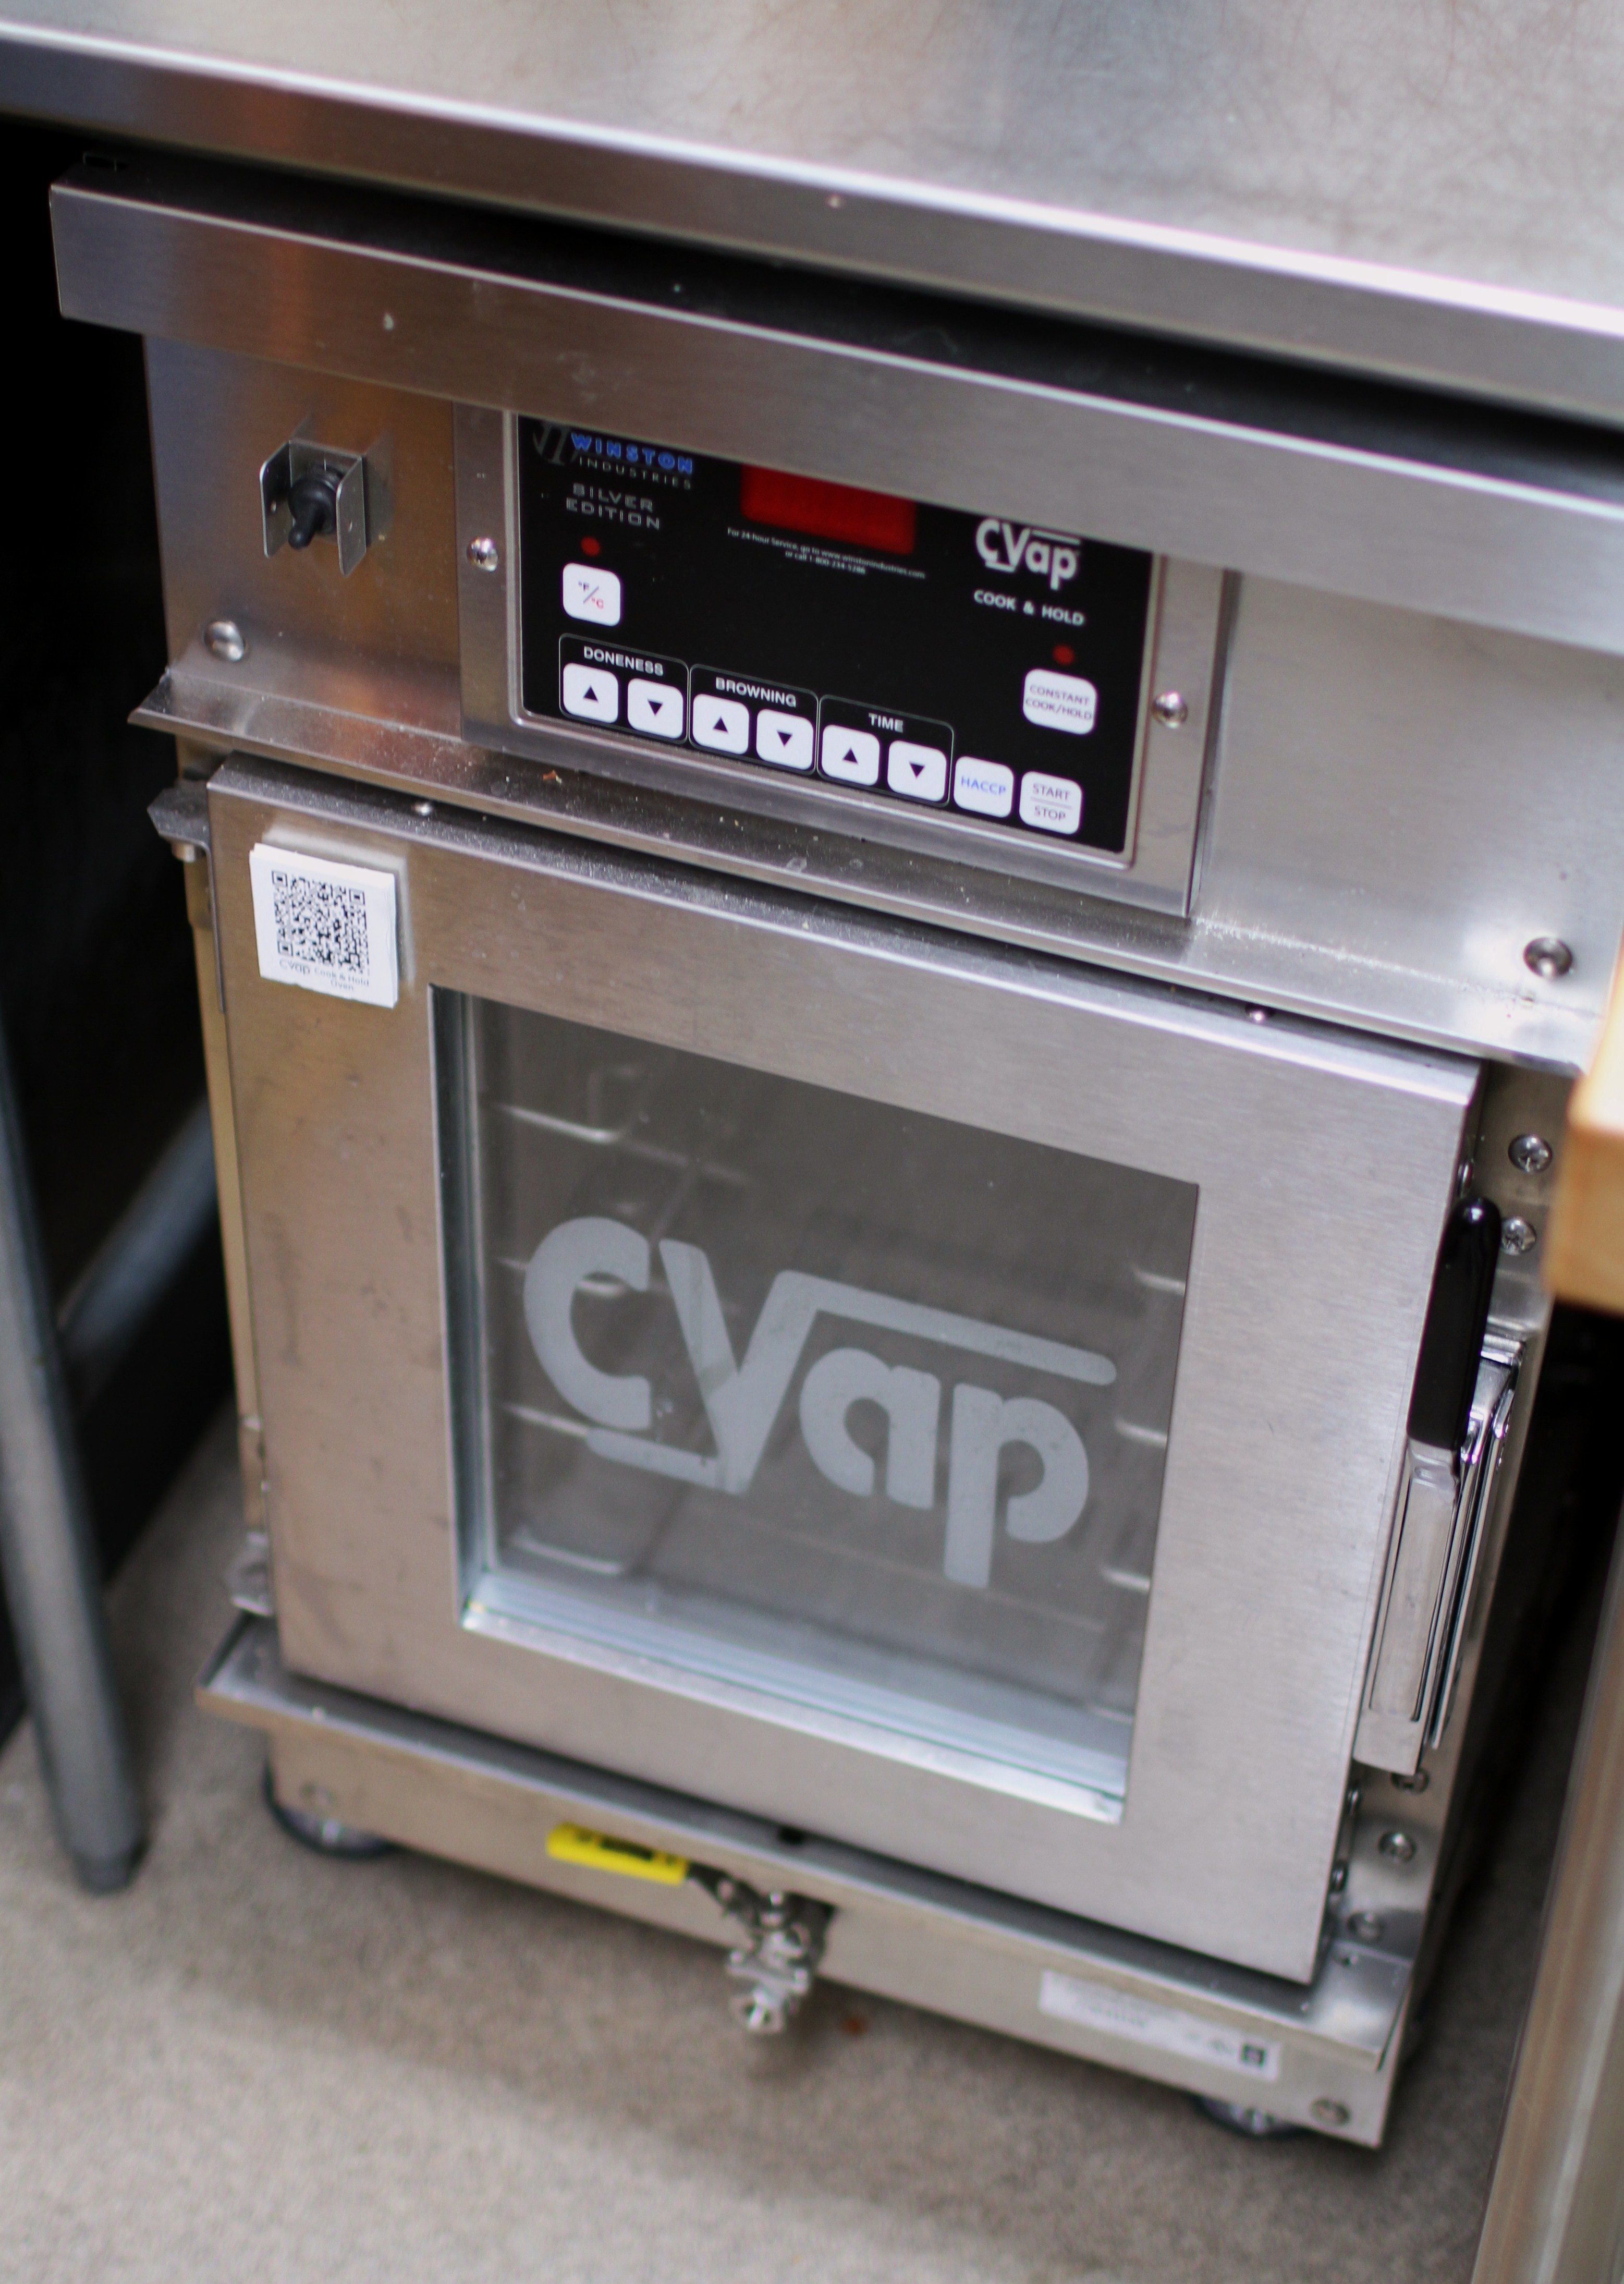 using my new cvap oven